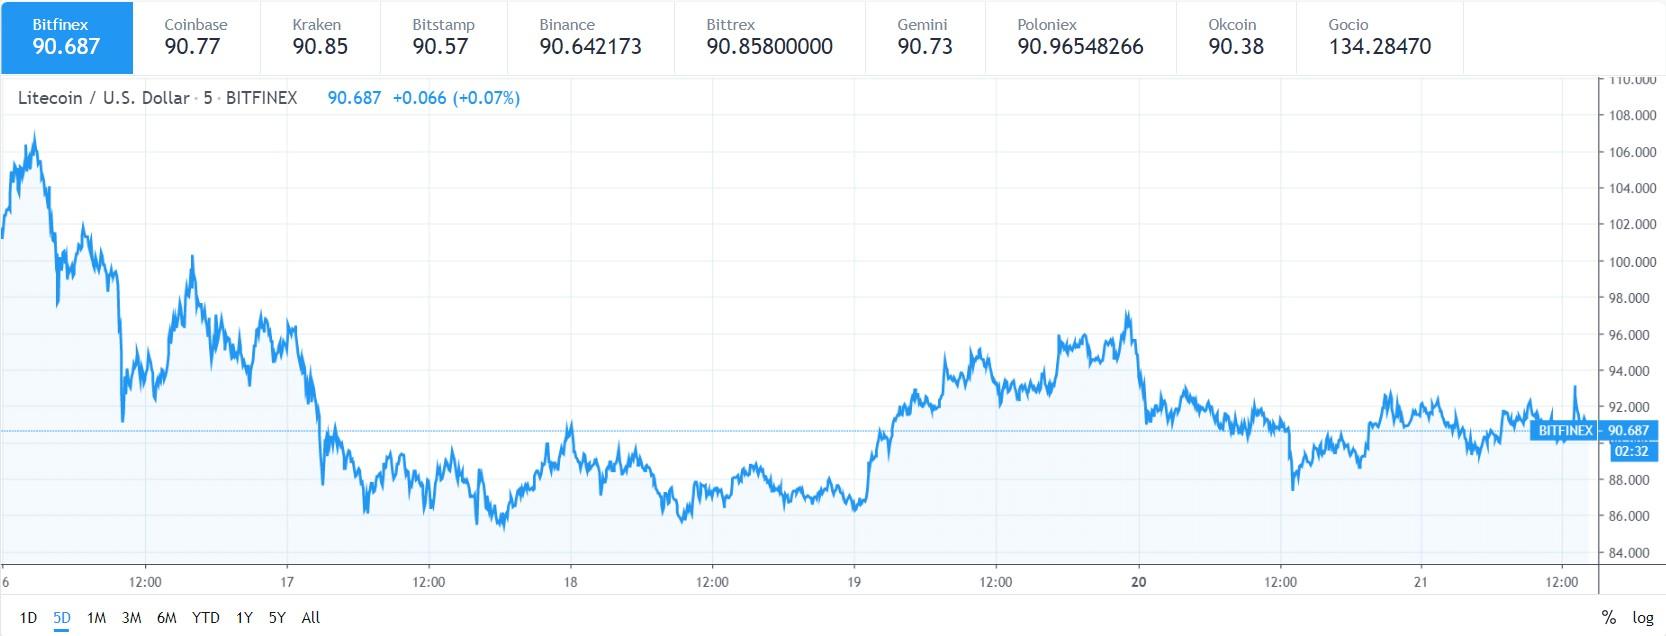 Litecoin price predictions 21 may